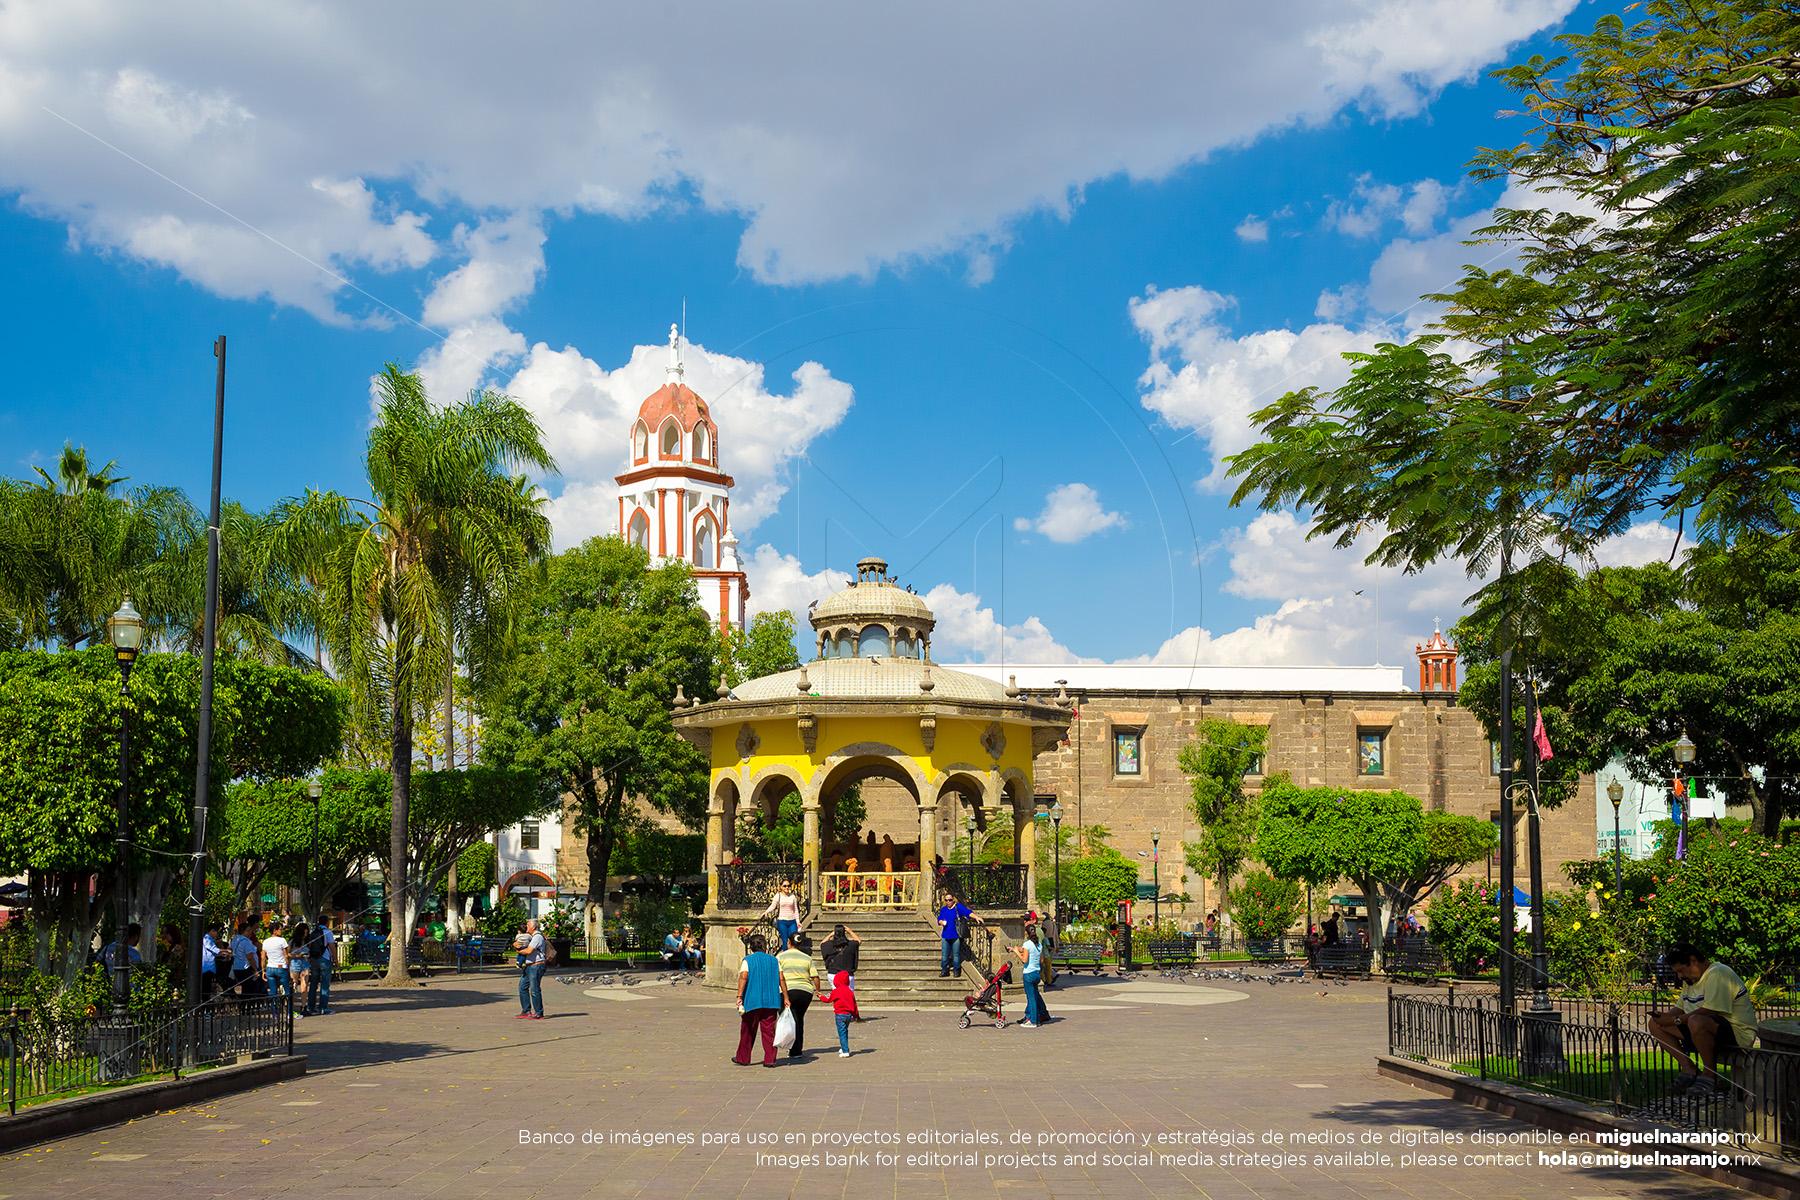 Plaza Tlaquepaque, Jalisco